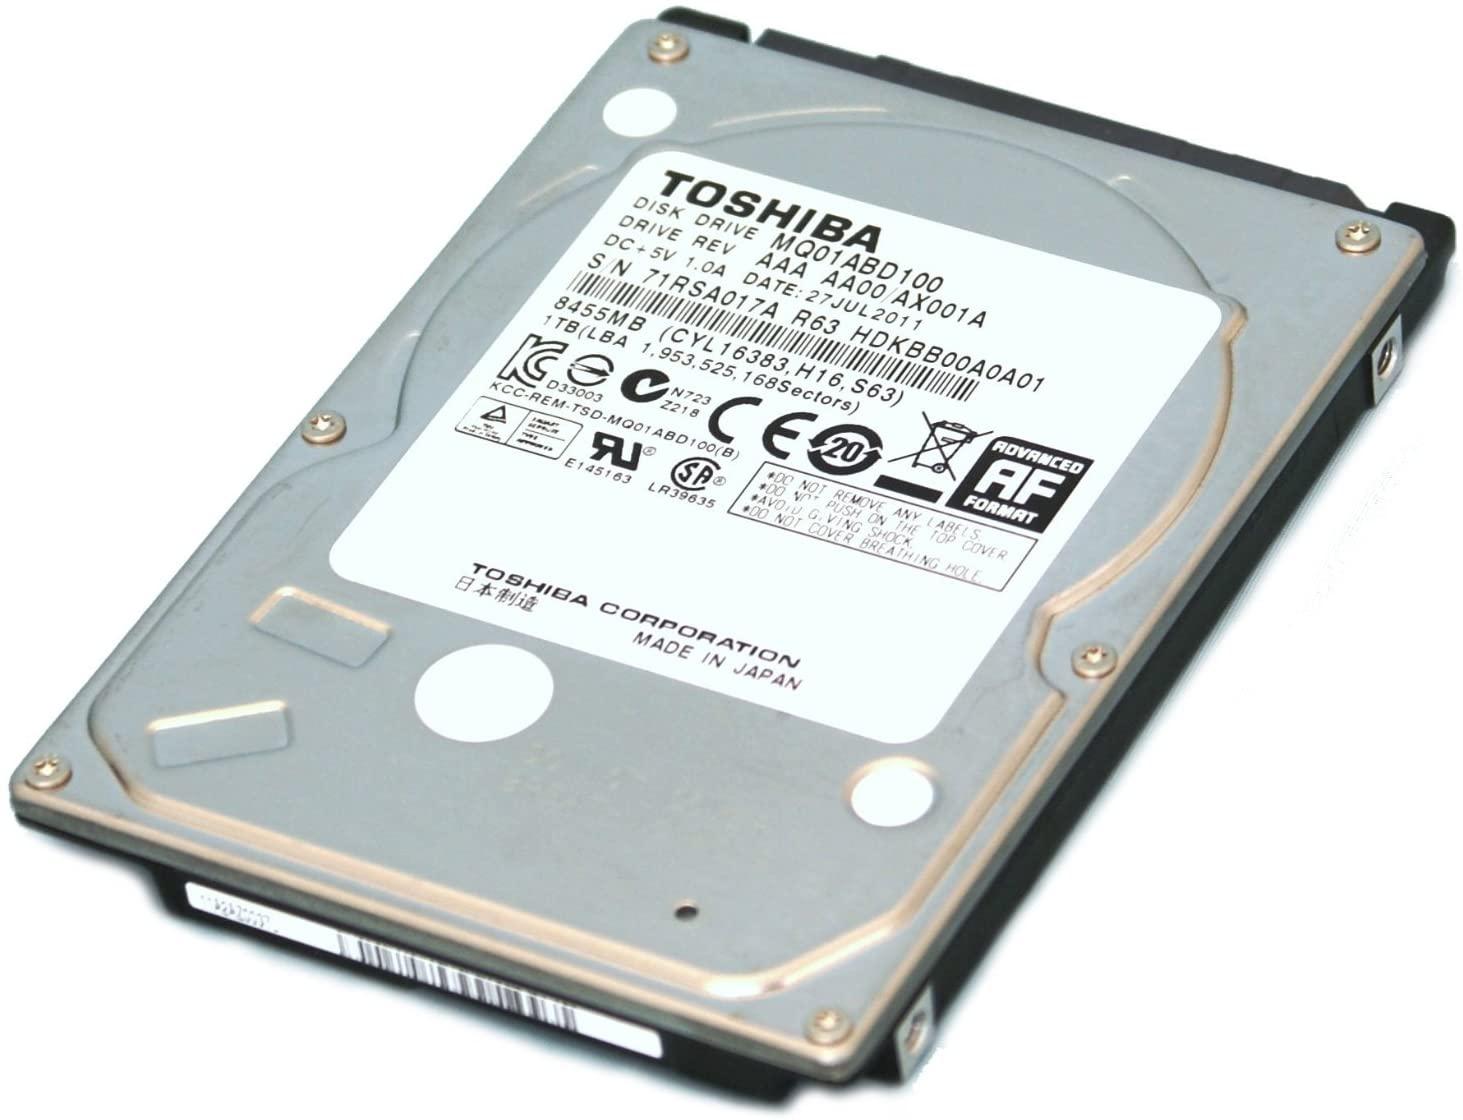 Toshiba Hard Drive - 640 GB - Internal - 2.5